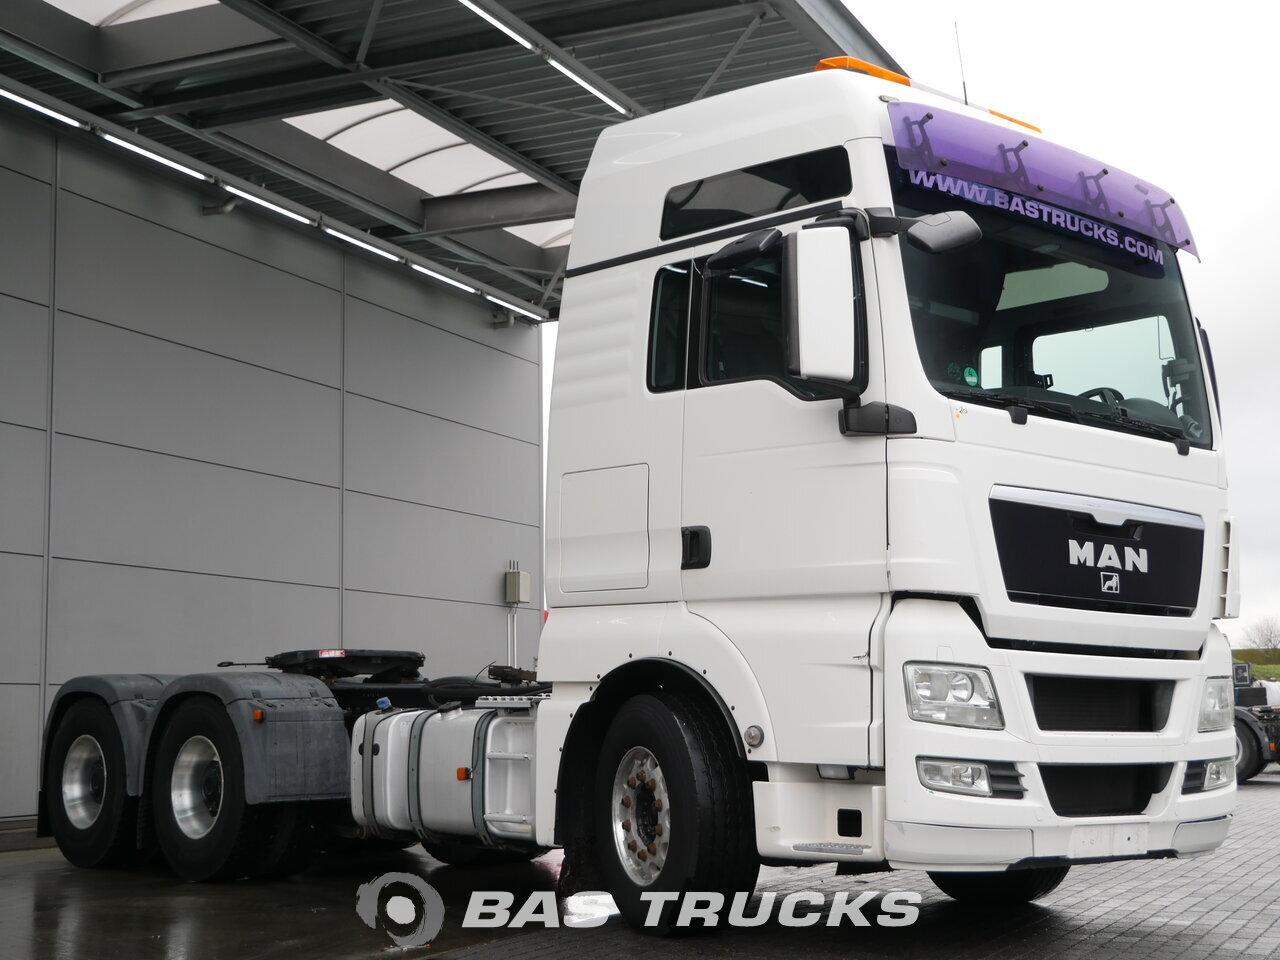 man tgx xxl tractorhead euro norm 5 39200 bas trucks. Black Bedroom Furniture Sets. Home Design Ideas